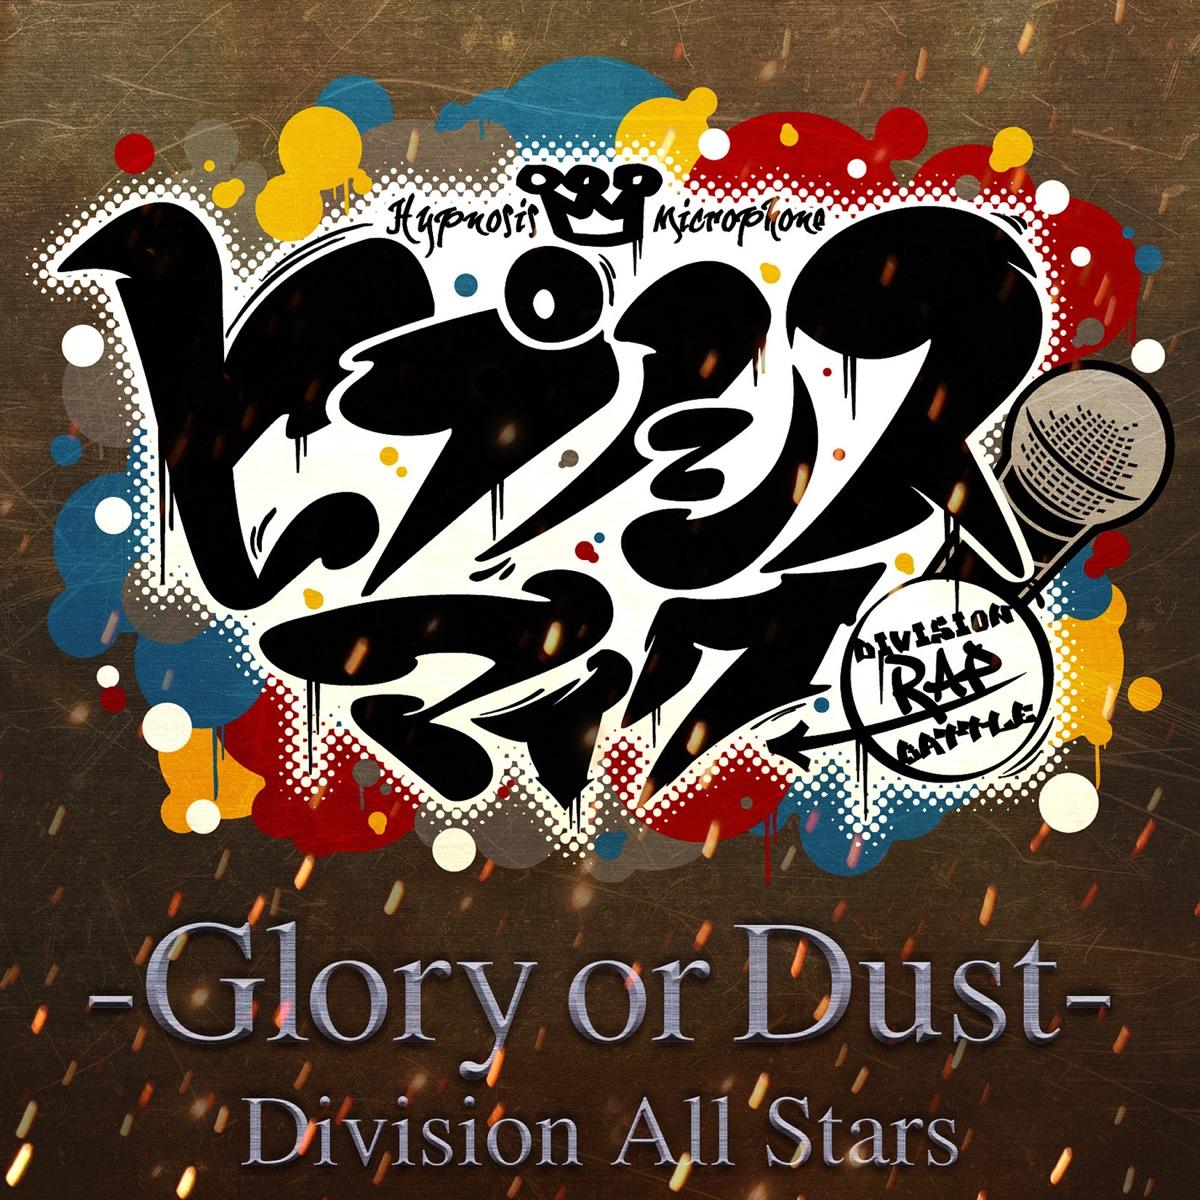 『Division All Stars - ヒプノシスマイク-Glory or Dust-』収録の『ヒプノシスマイク-Glory or Dust-』ジャケット